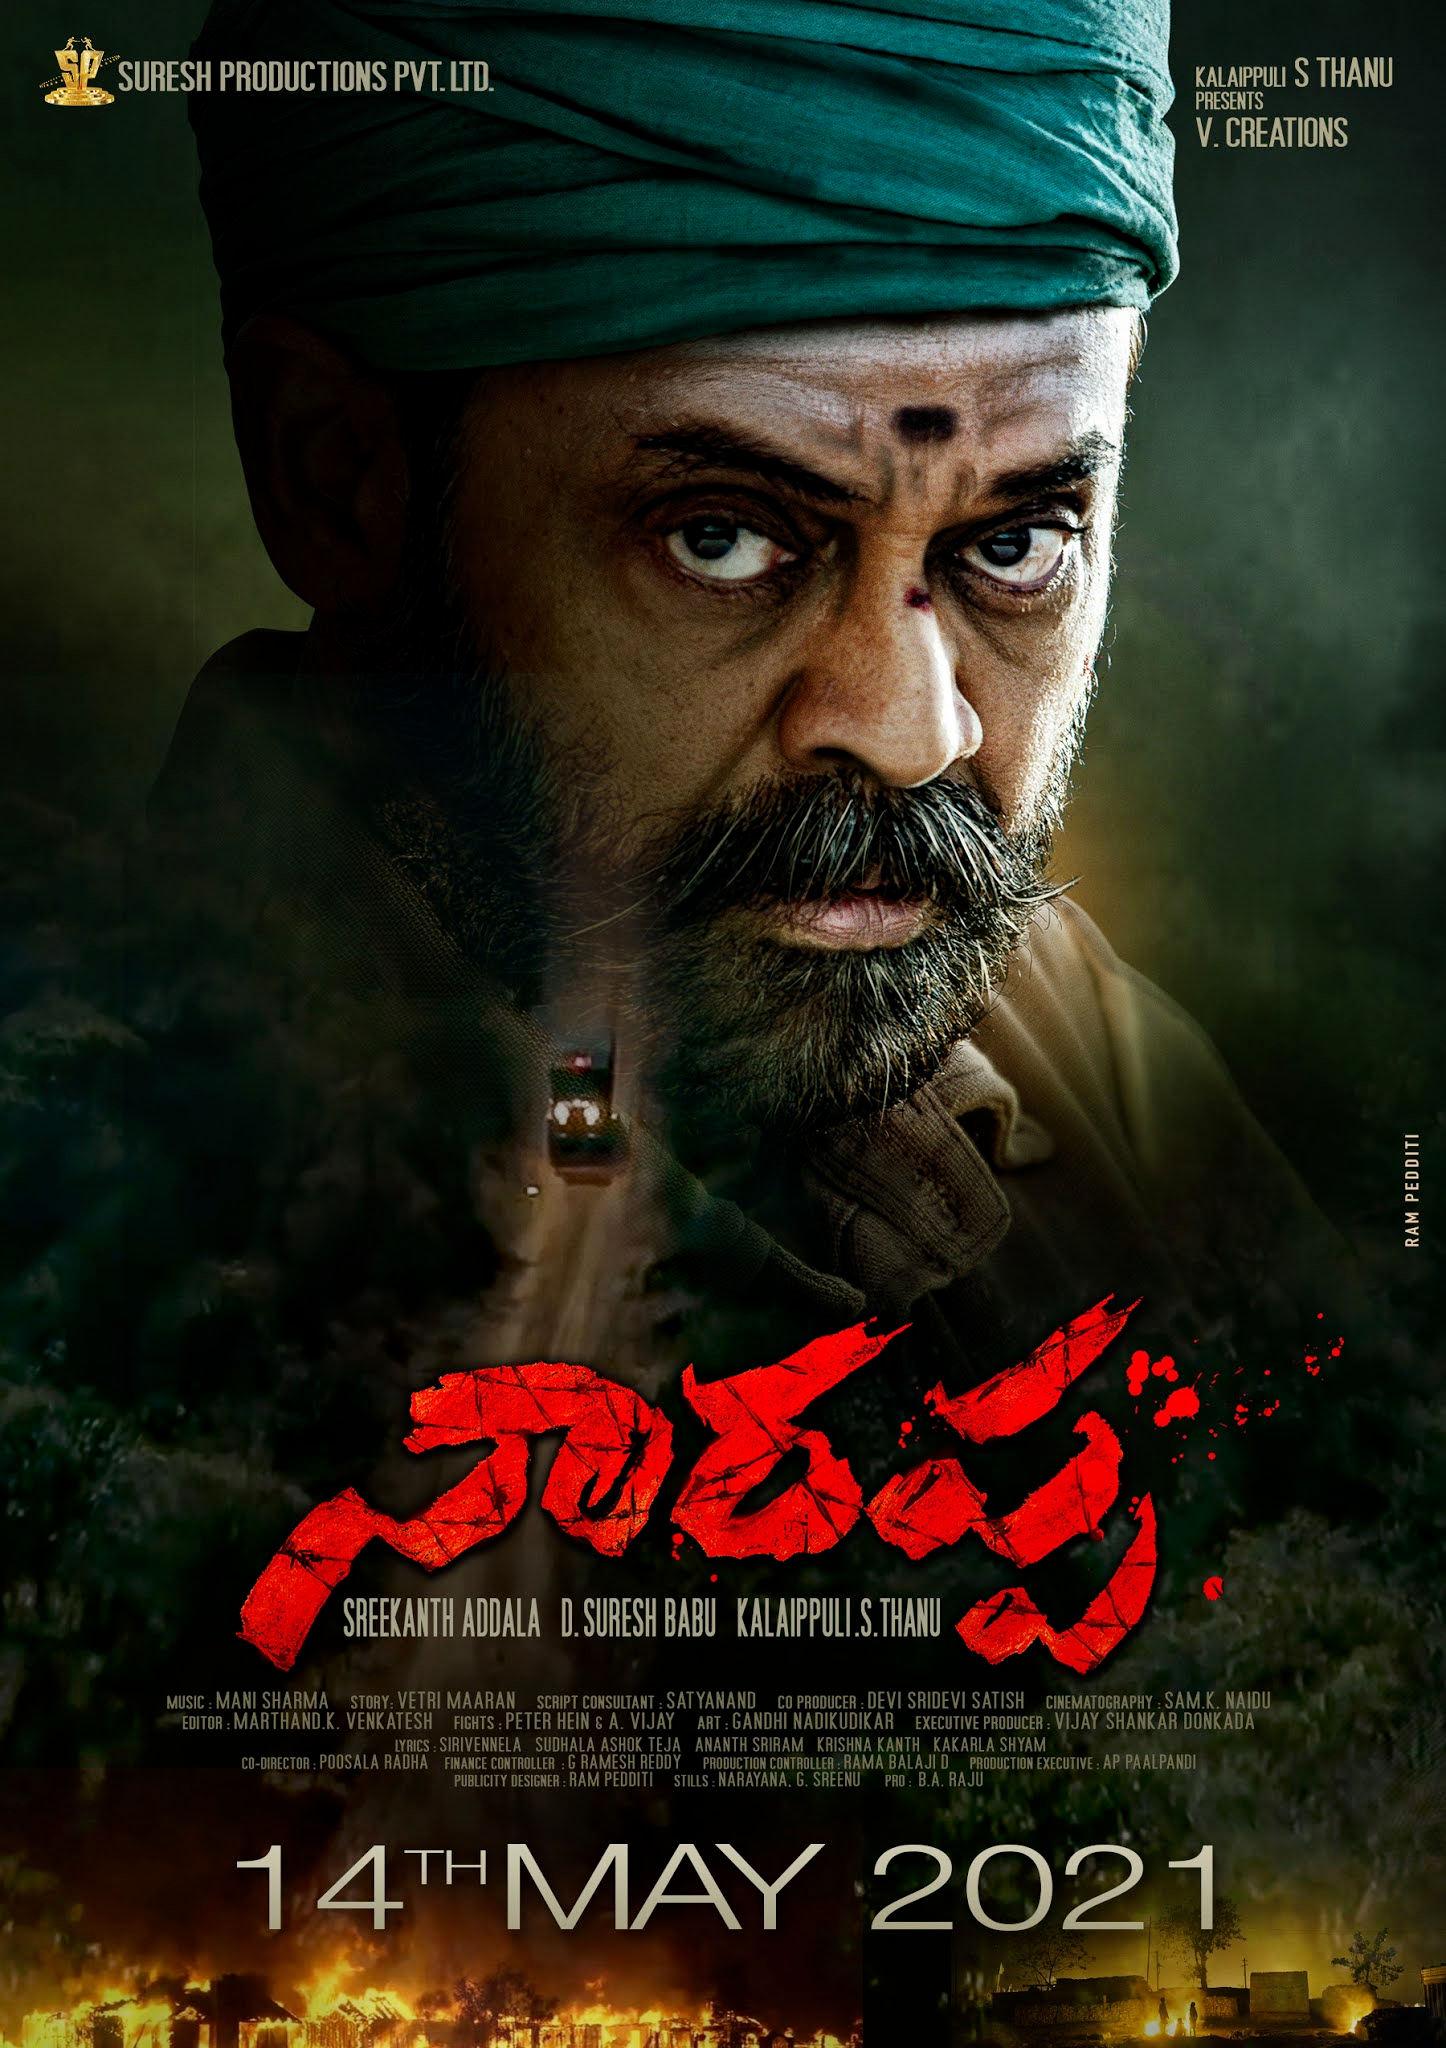 Venkatesh Narappa movie releasing on May 14th